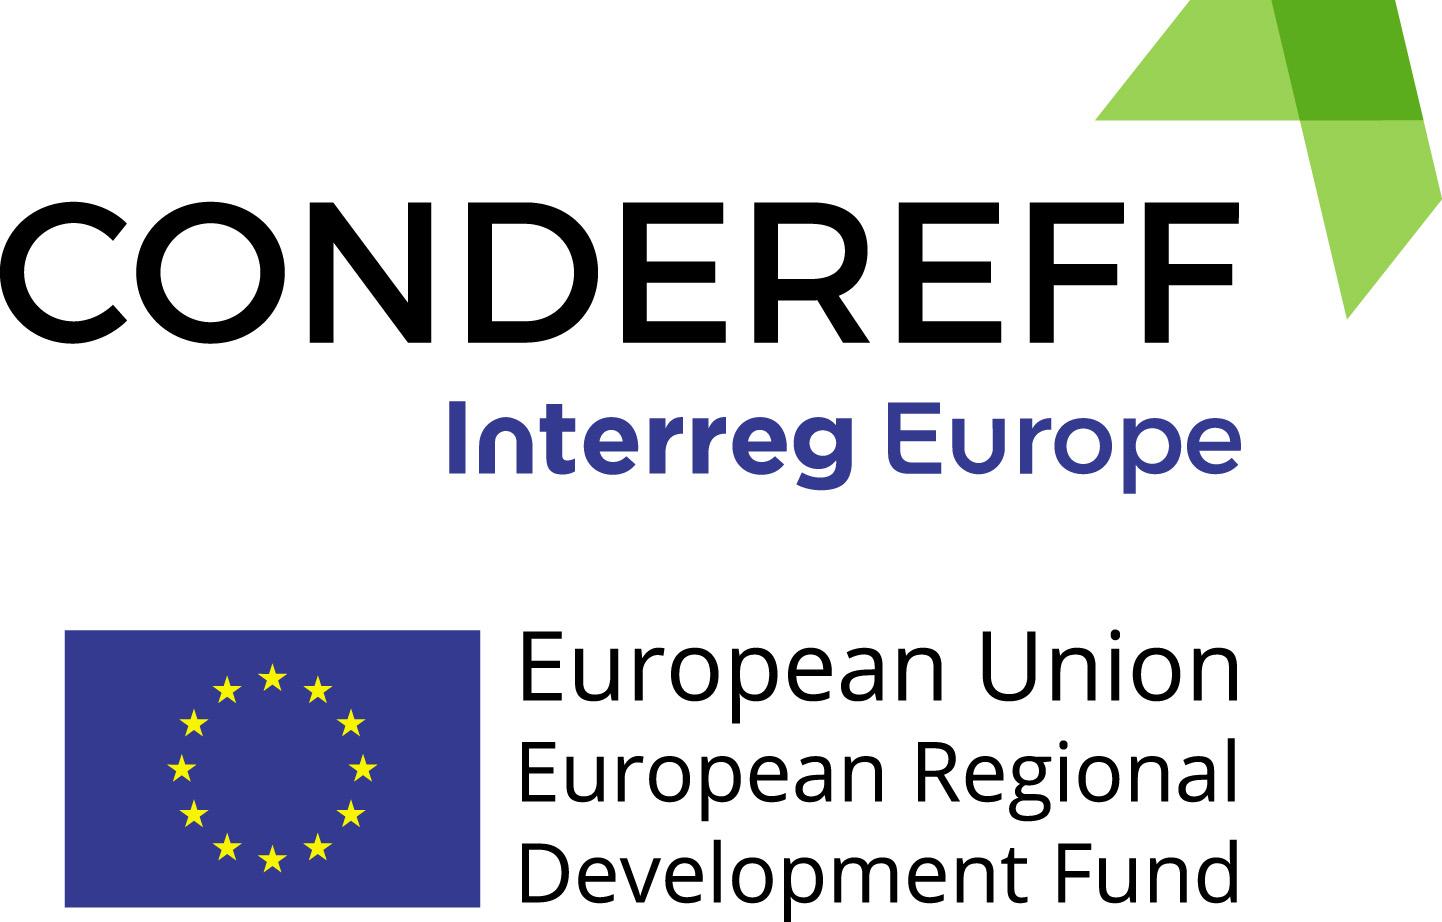 CONDEREFF-Interreg EUROPE